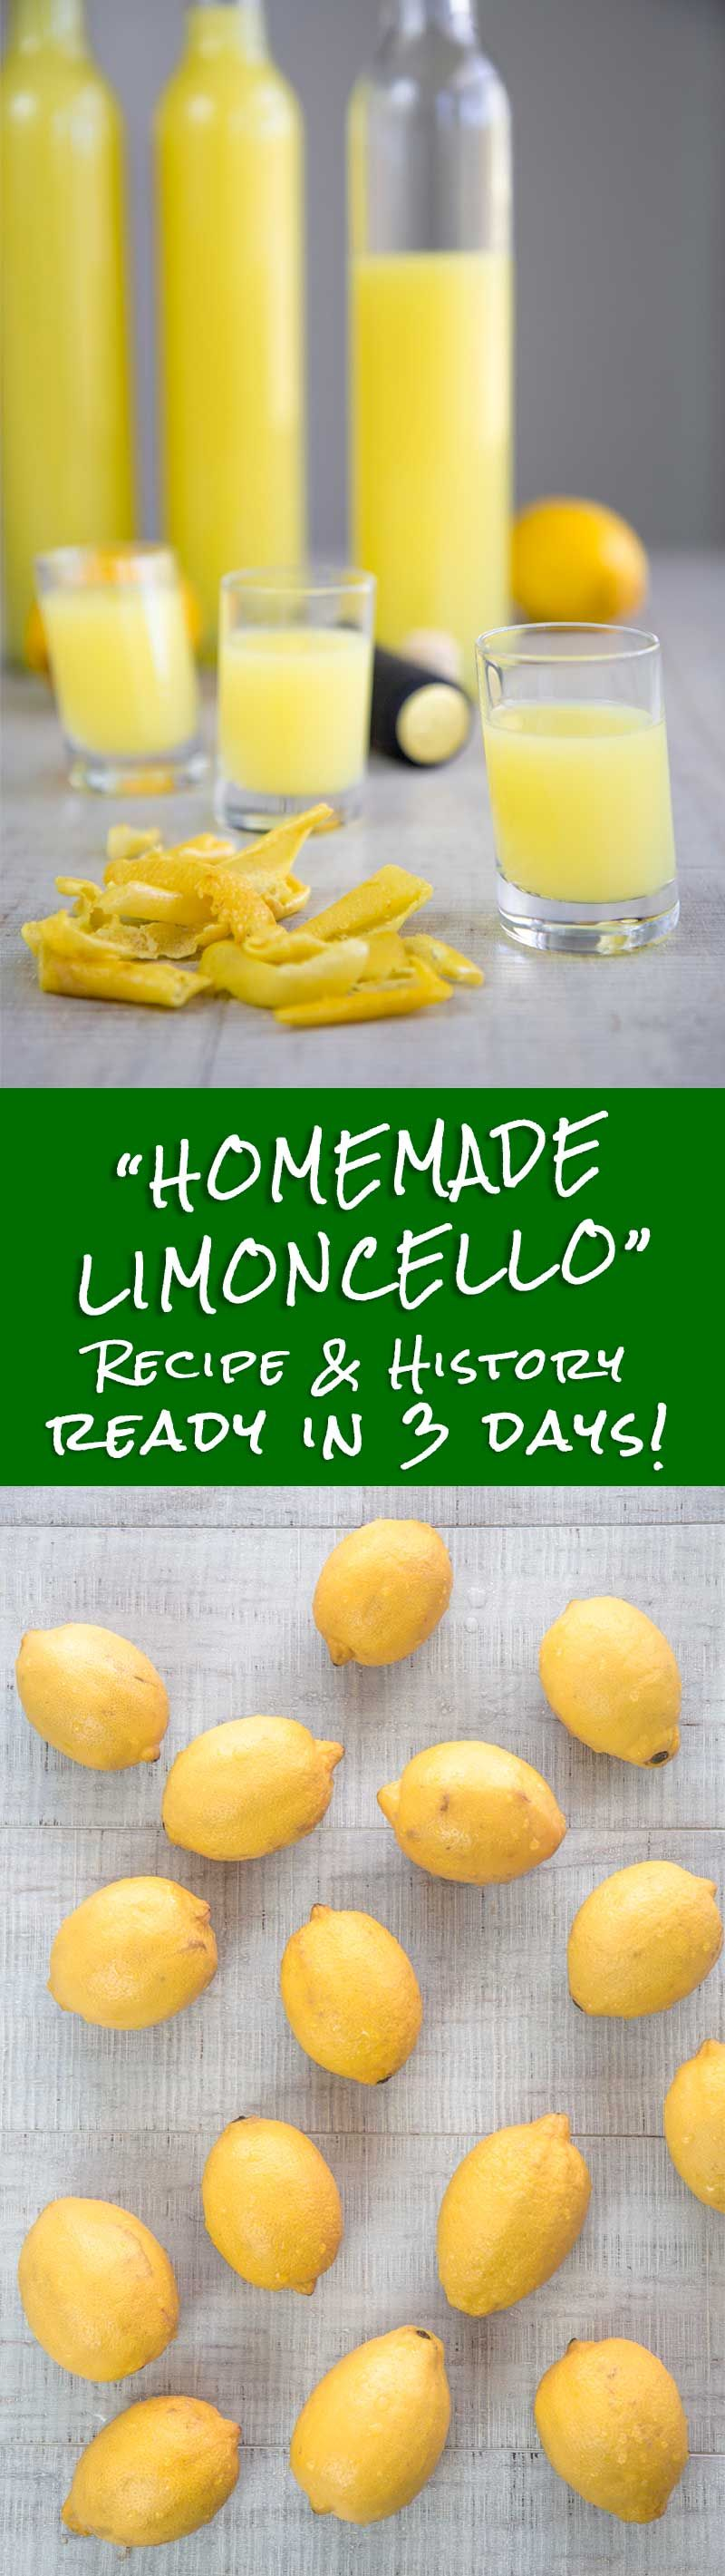 HOMEMADE LIMONCELLO ITALIAN RECIPE AND HISTORY  ready in 3 days  Homemade Limoncello is a recipe very easy to prepare a must for any Italian festivity Even if the traditi...